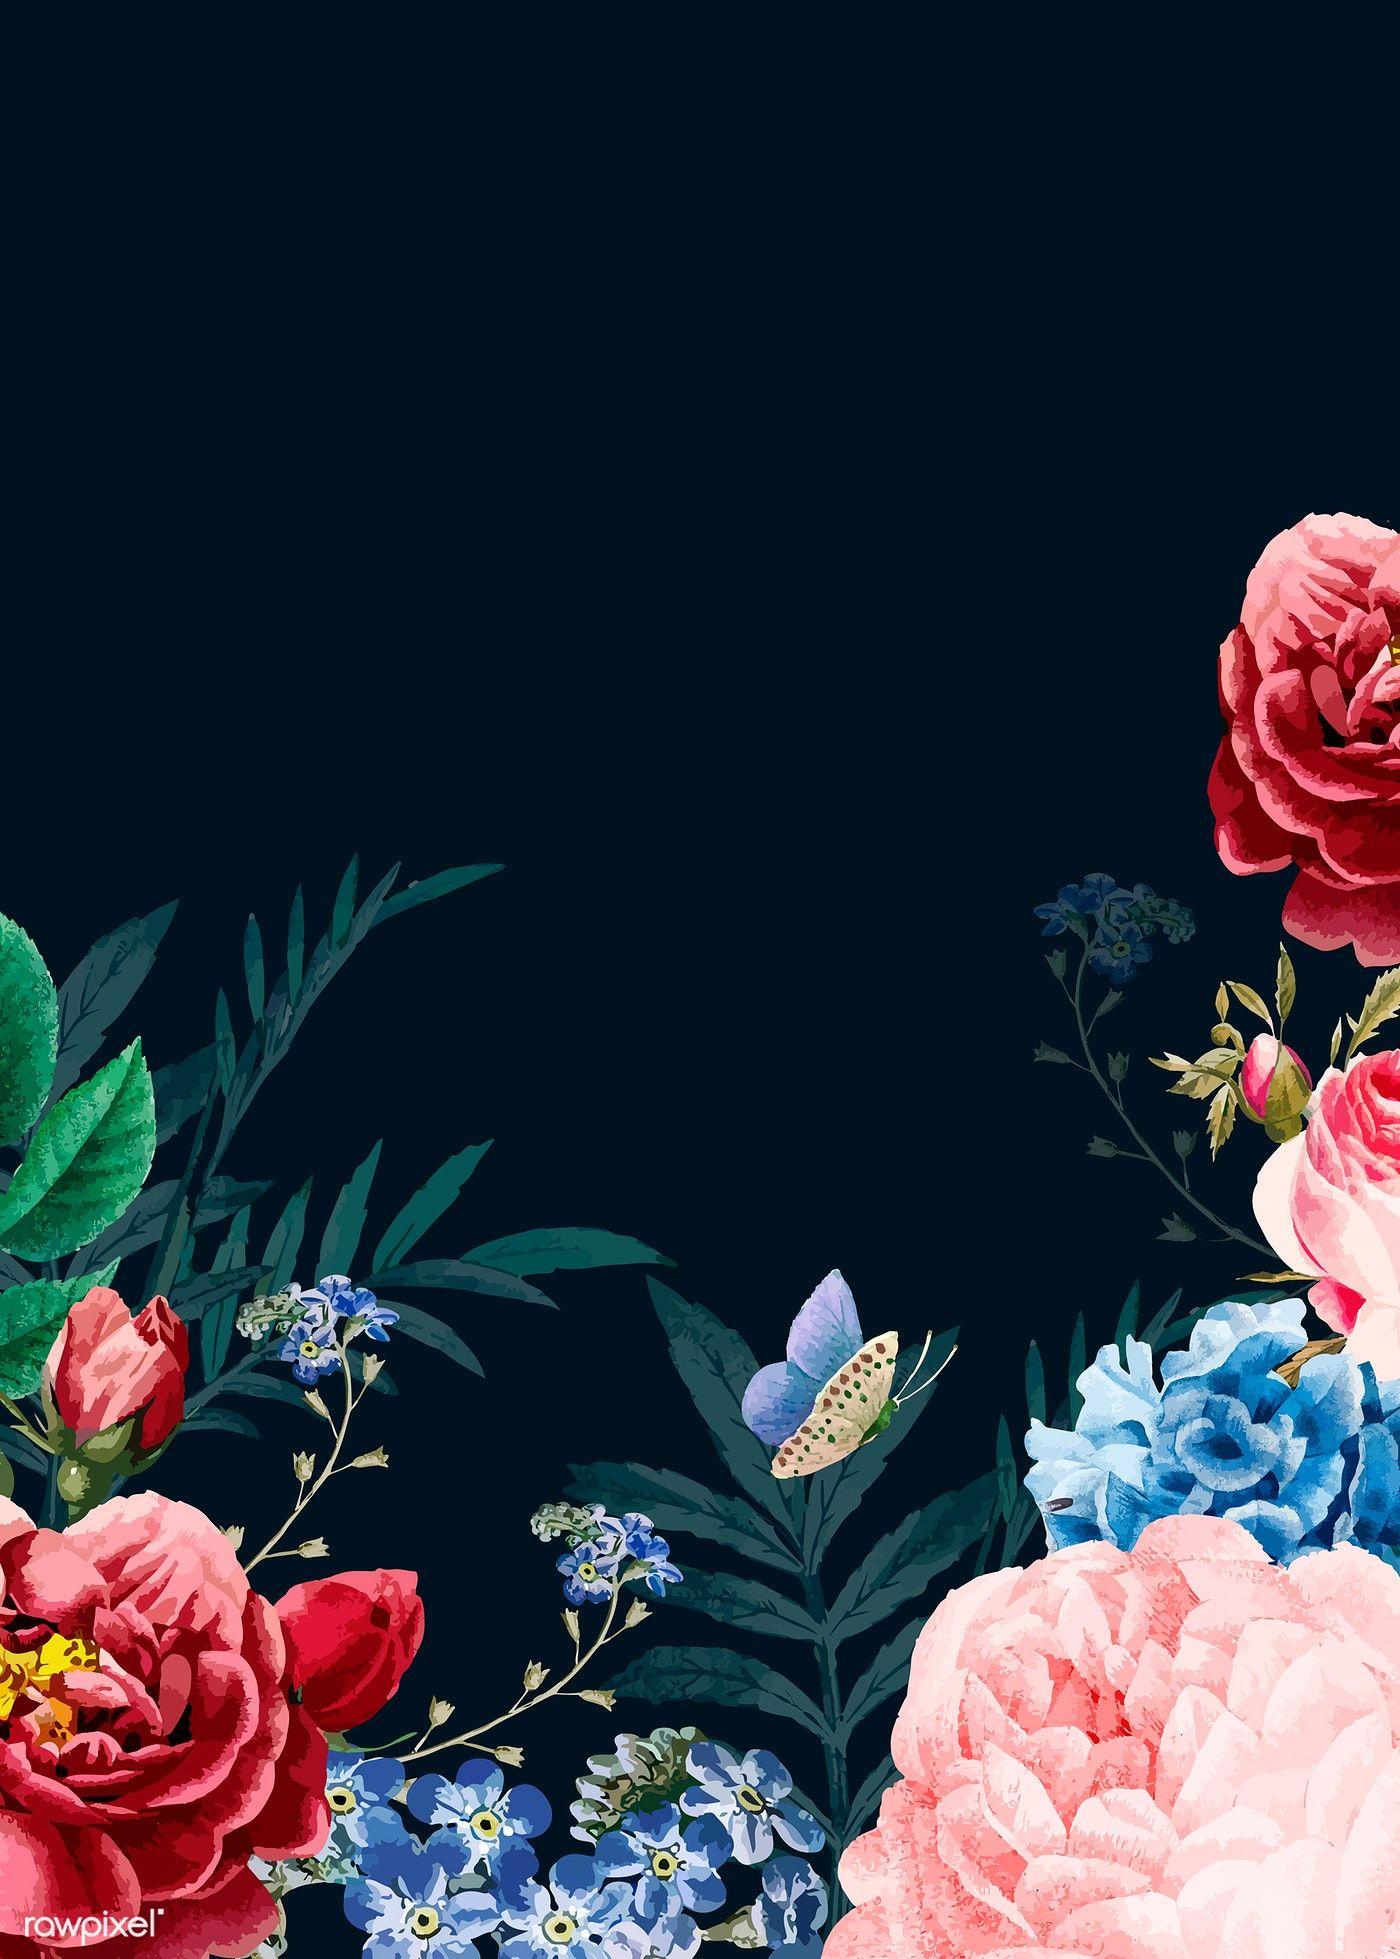 Download Premium Vector Of Blooming Elegant Floral Background Vector 681568 Floral Background Apple Watch Wallpaper Floral Poster Flower wallpapers full hd fantasy